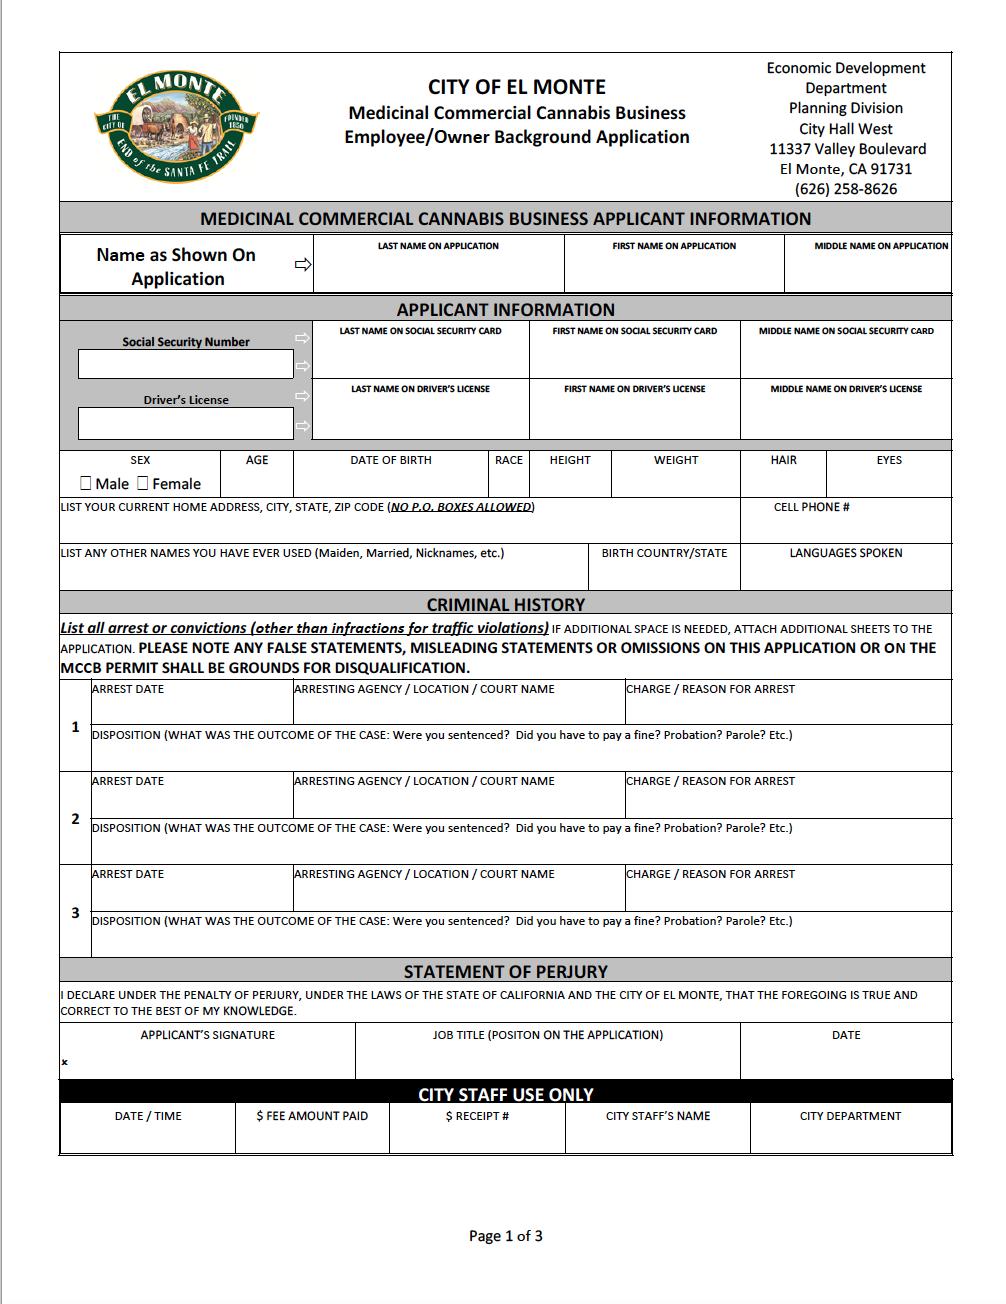 Background Application Form.png